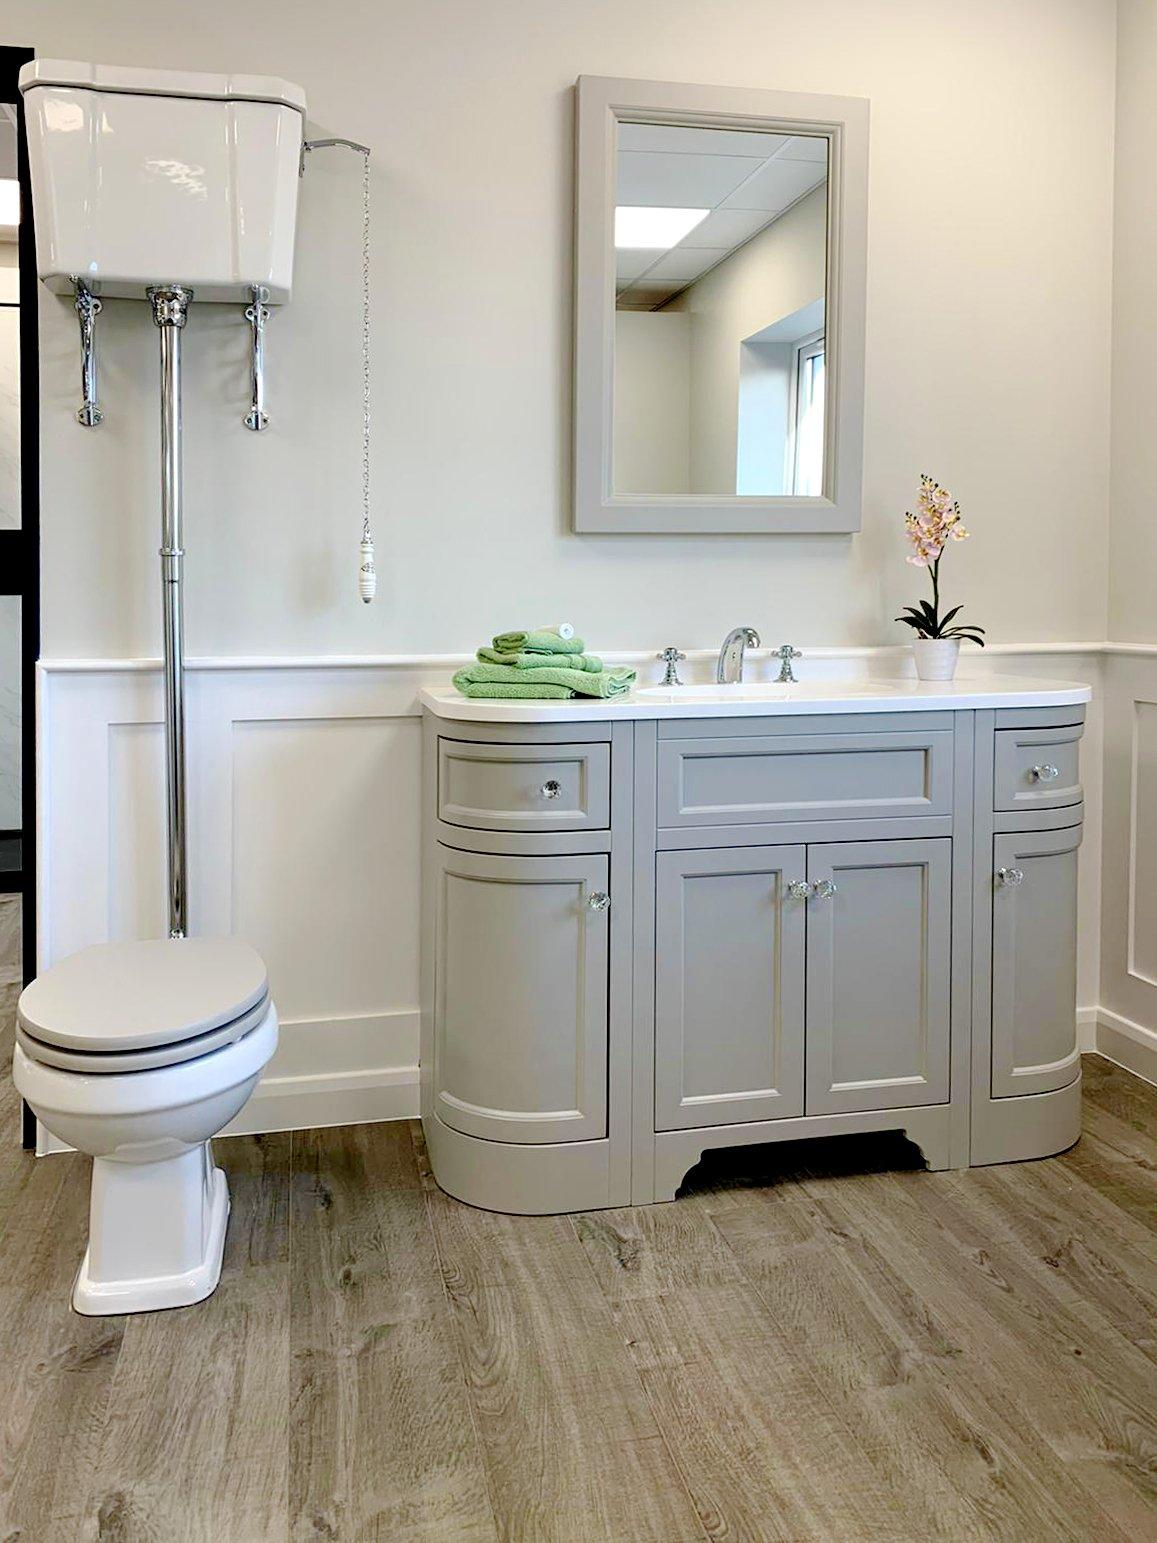 Burlington high level cistern bathroom with traditional vanity unit